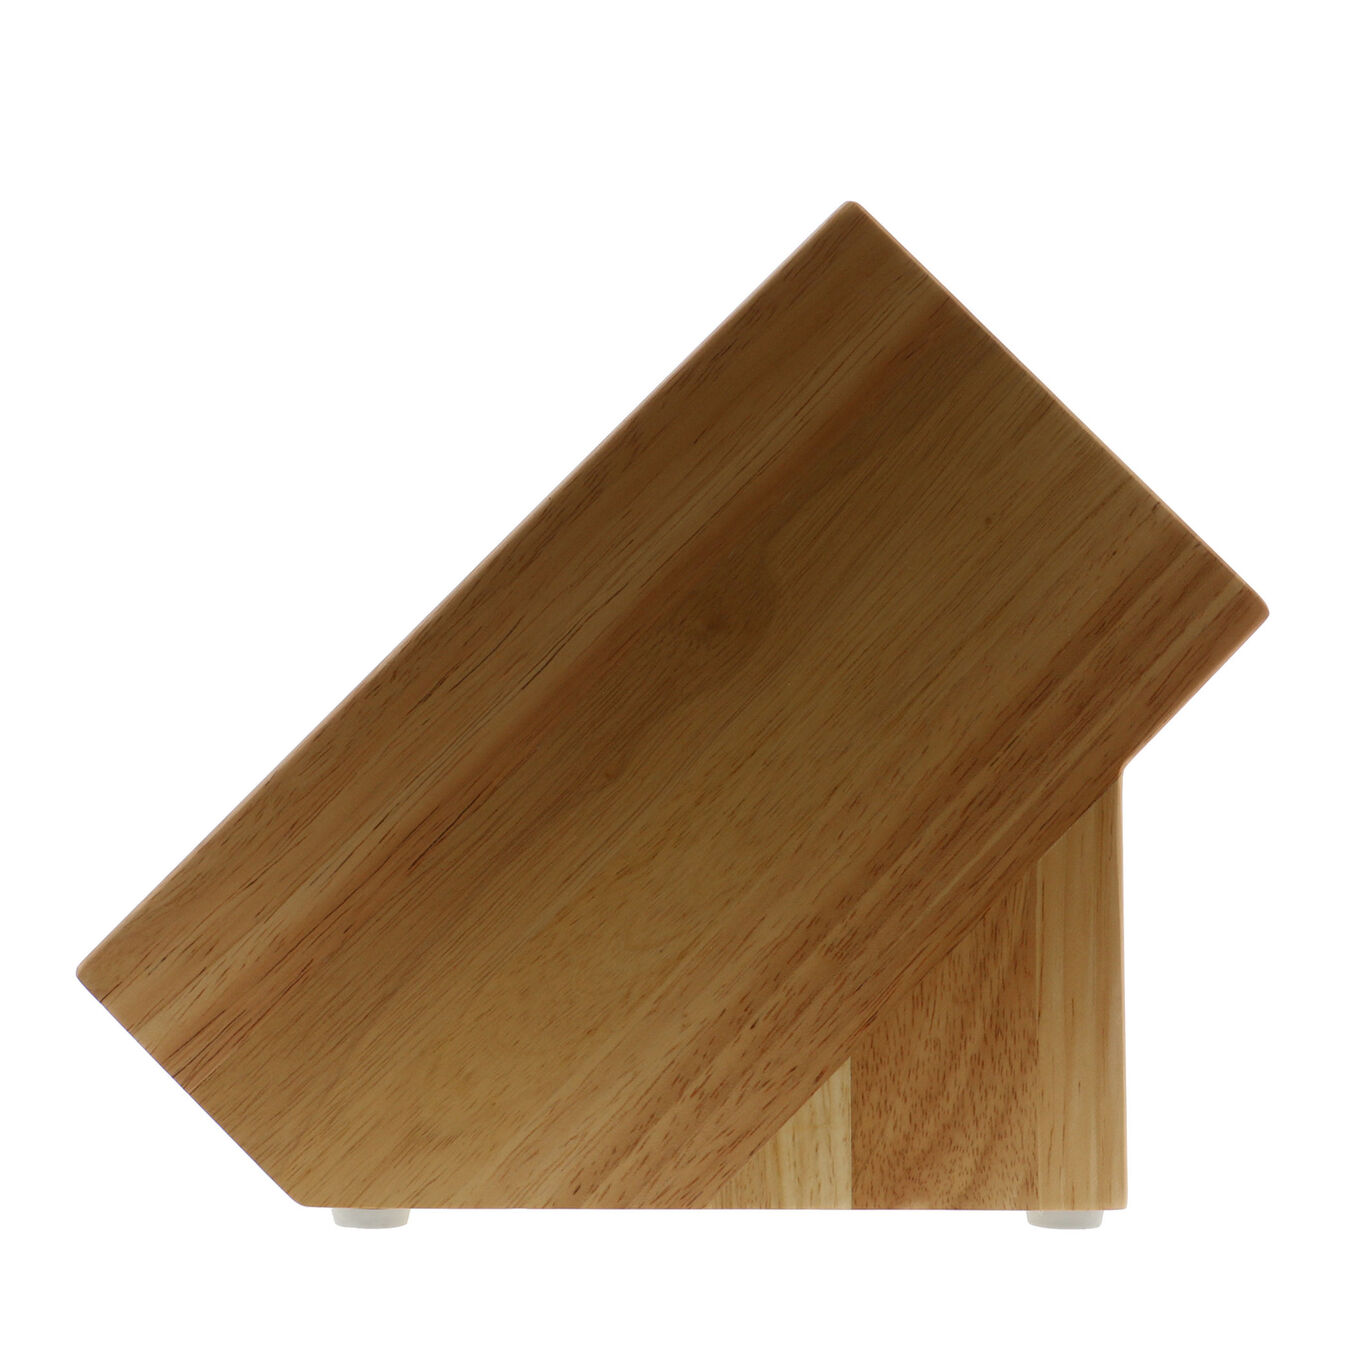 6, rubberwood, Twin Studio Block Empty,,large 4